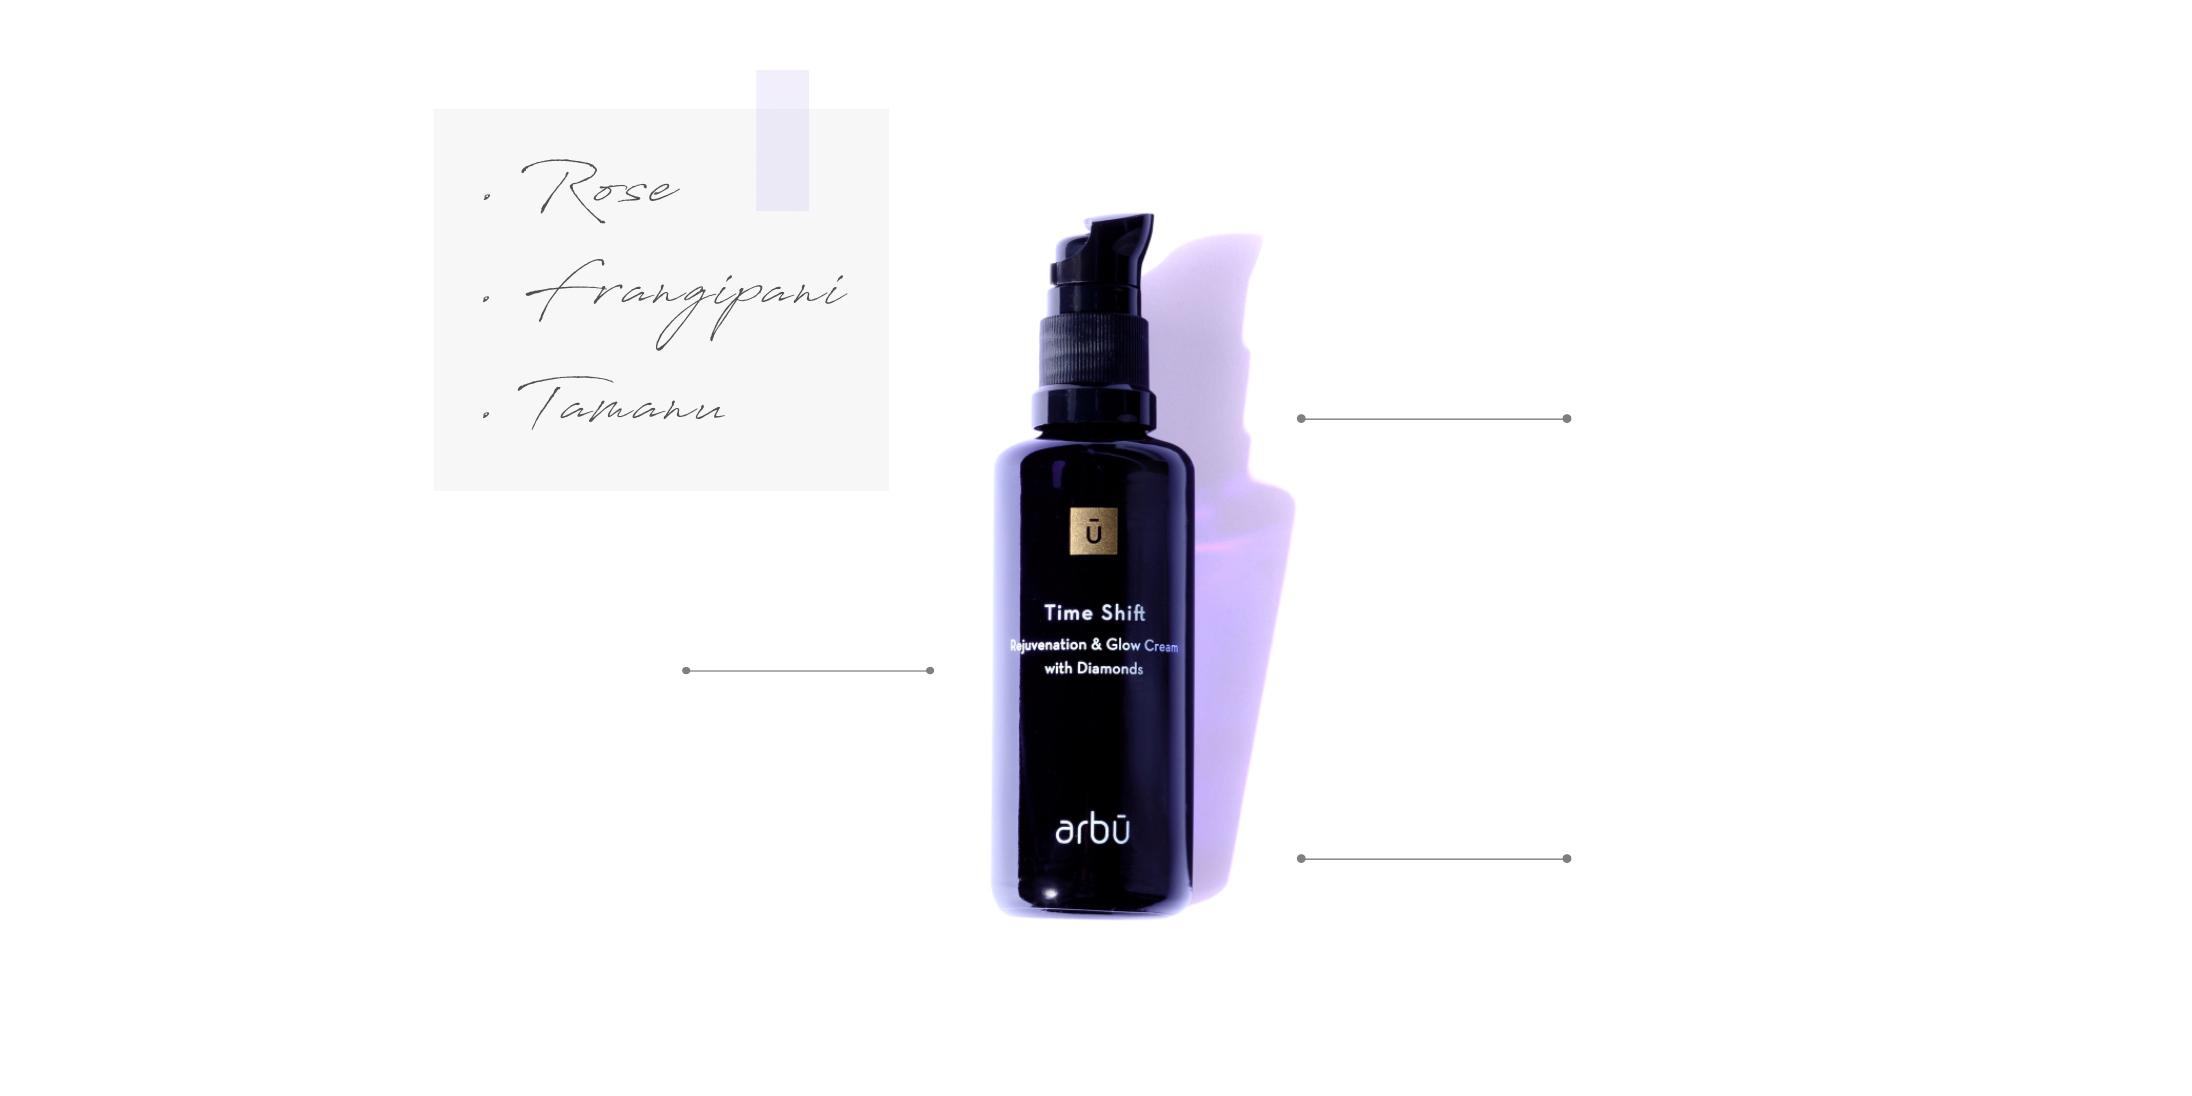 arbū time shift rejuvenation and glow cream ingredients